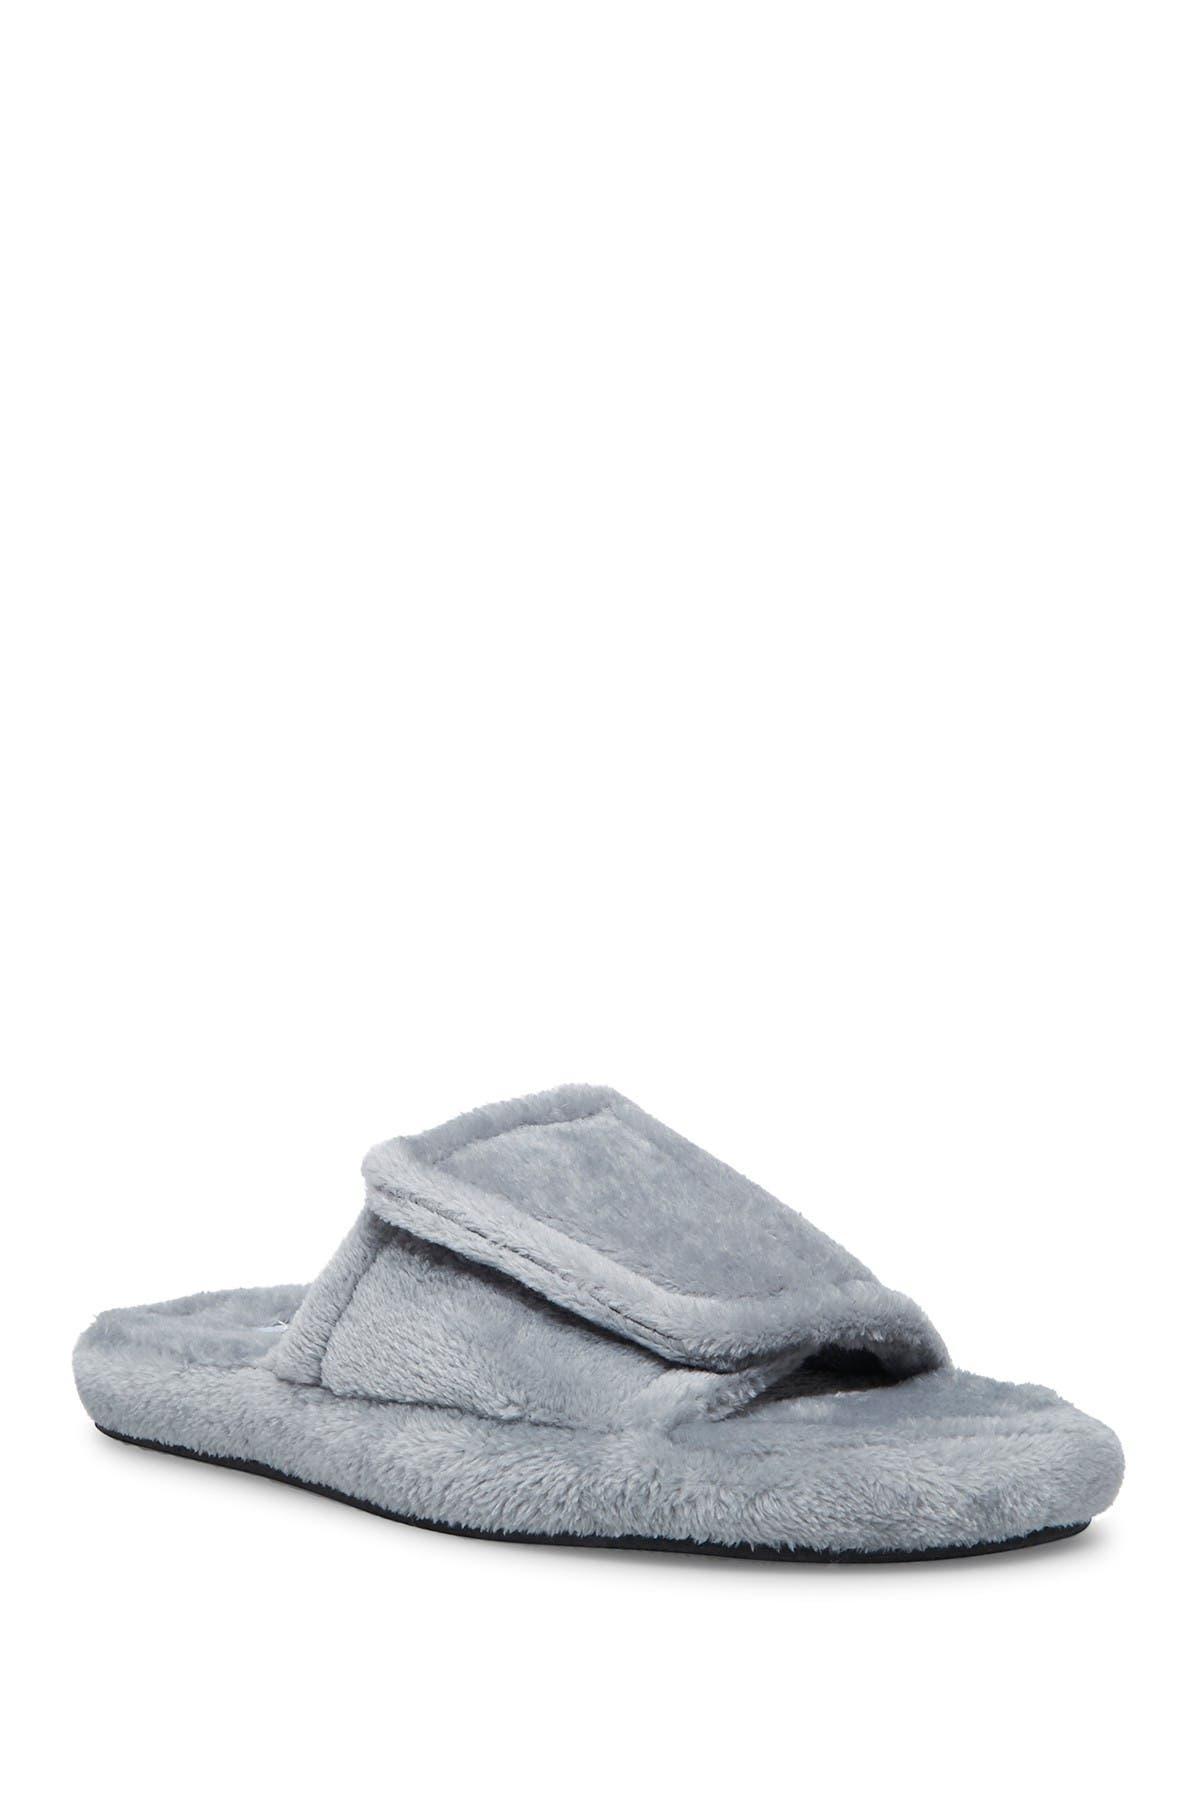 Image of Steve Madden Ezri Faux Fur Slide Sandal